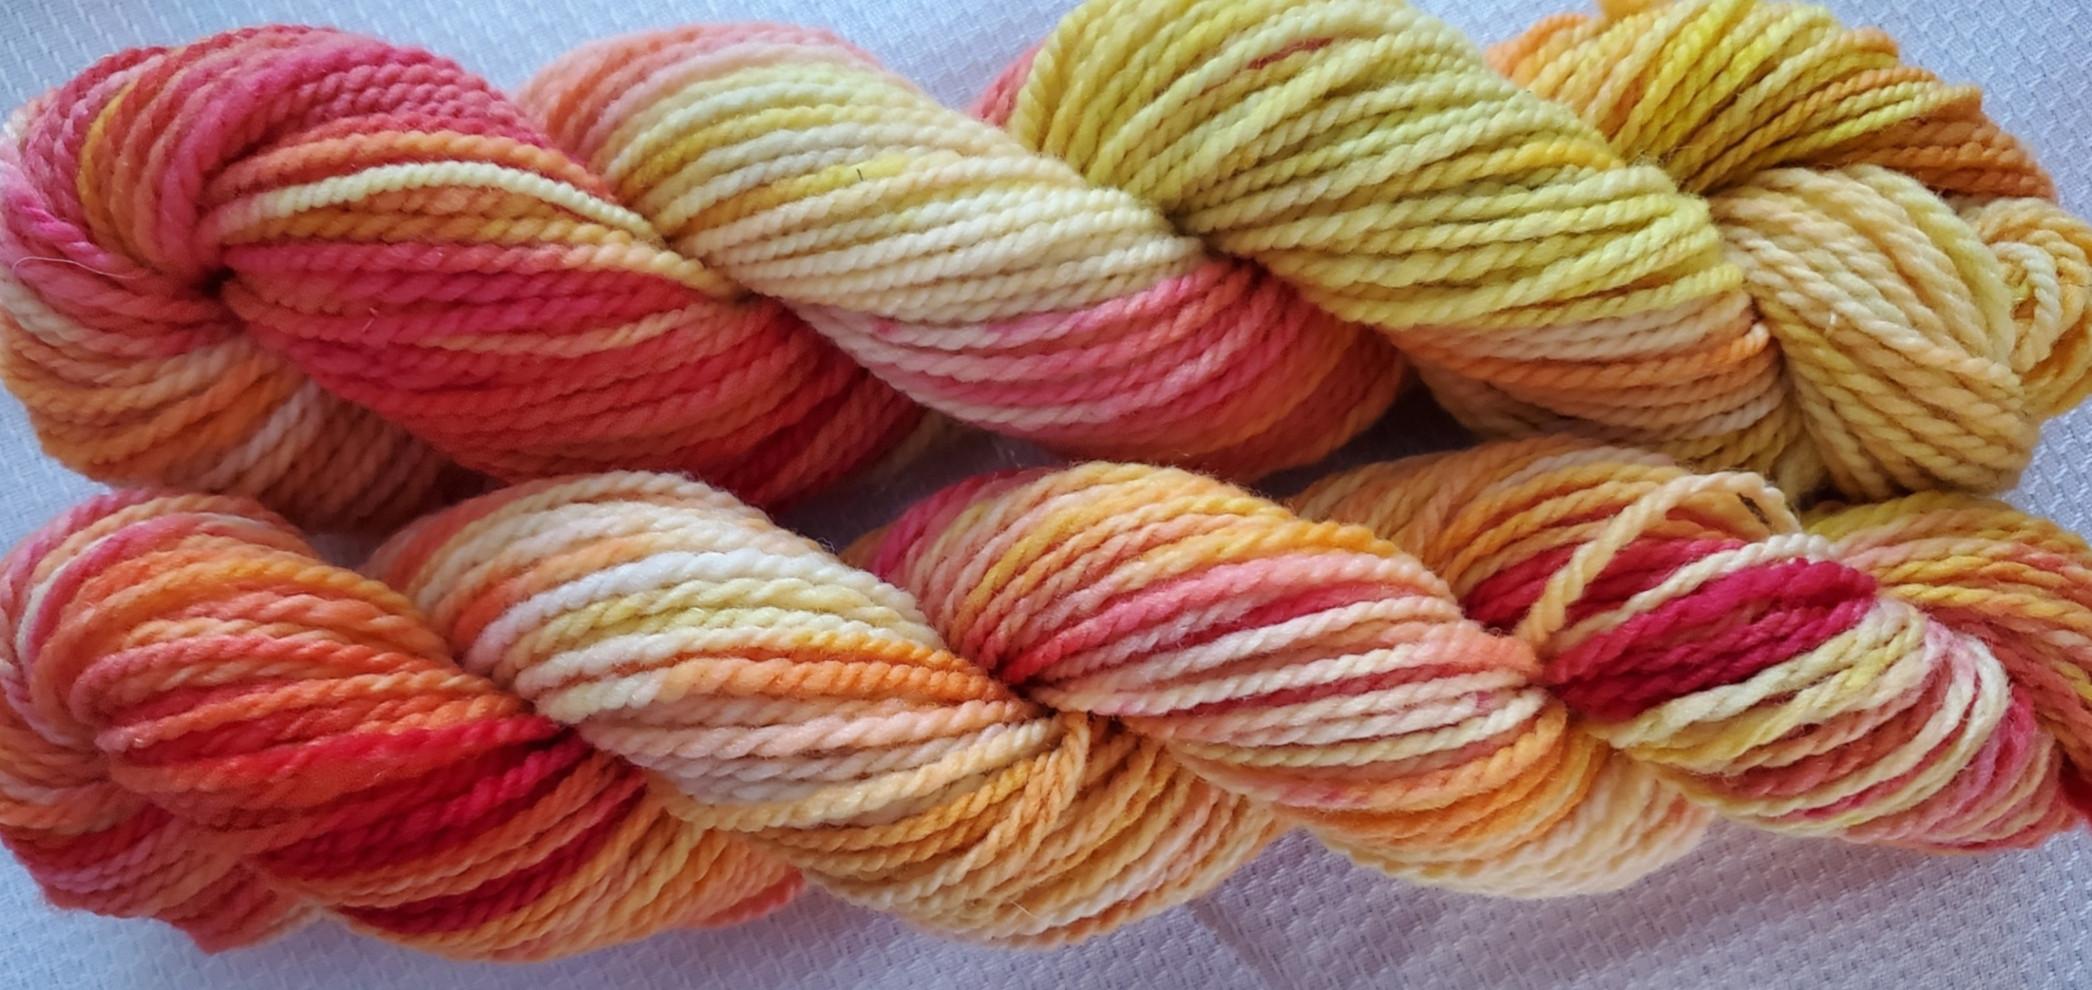 Hand Dyed Yarn - lot 21-1 (yellow-orange-red)